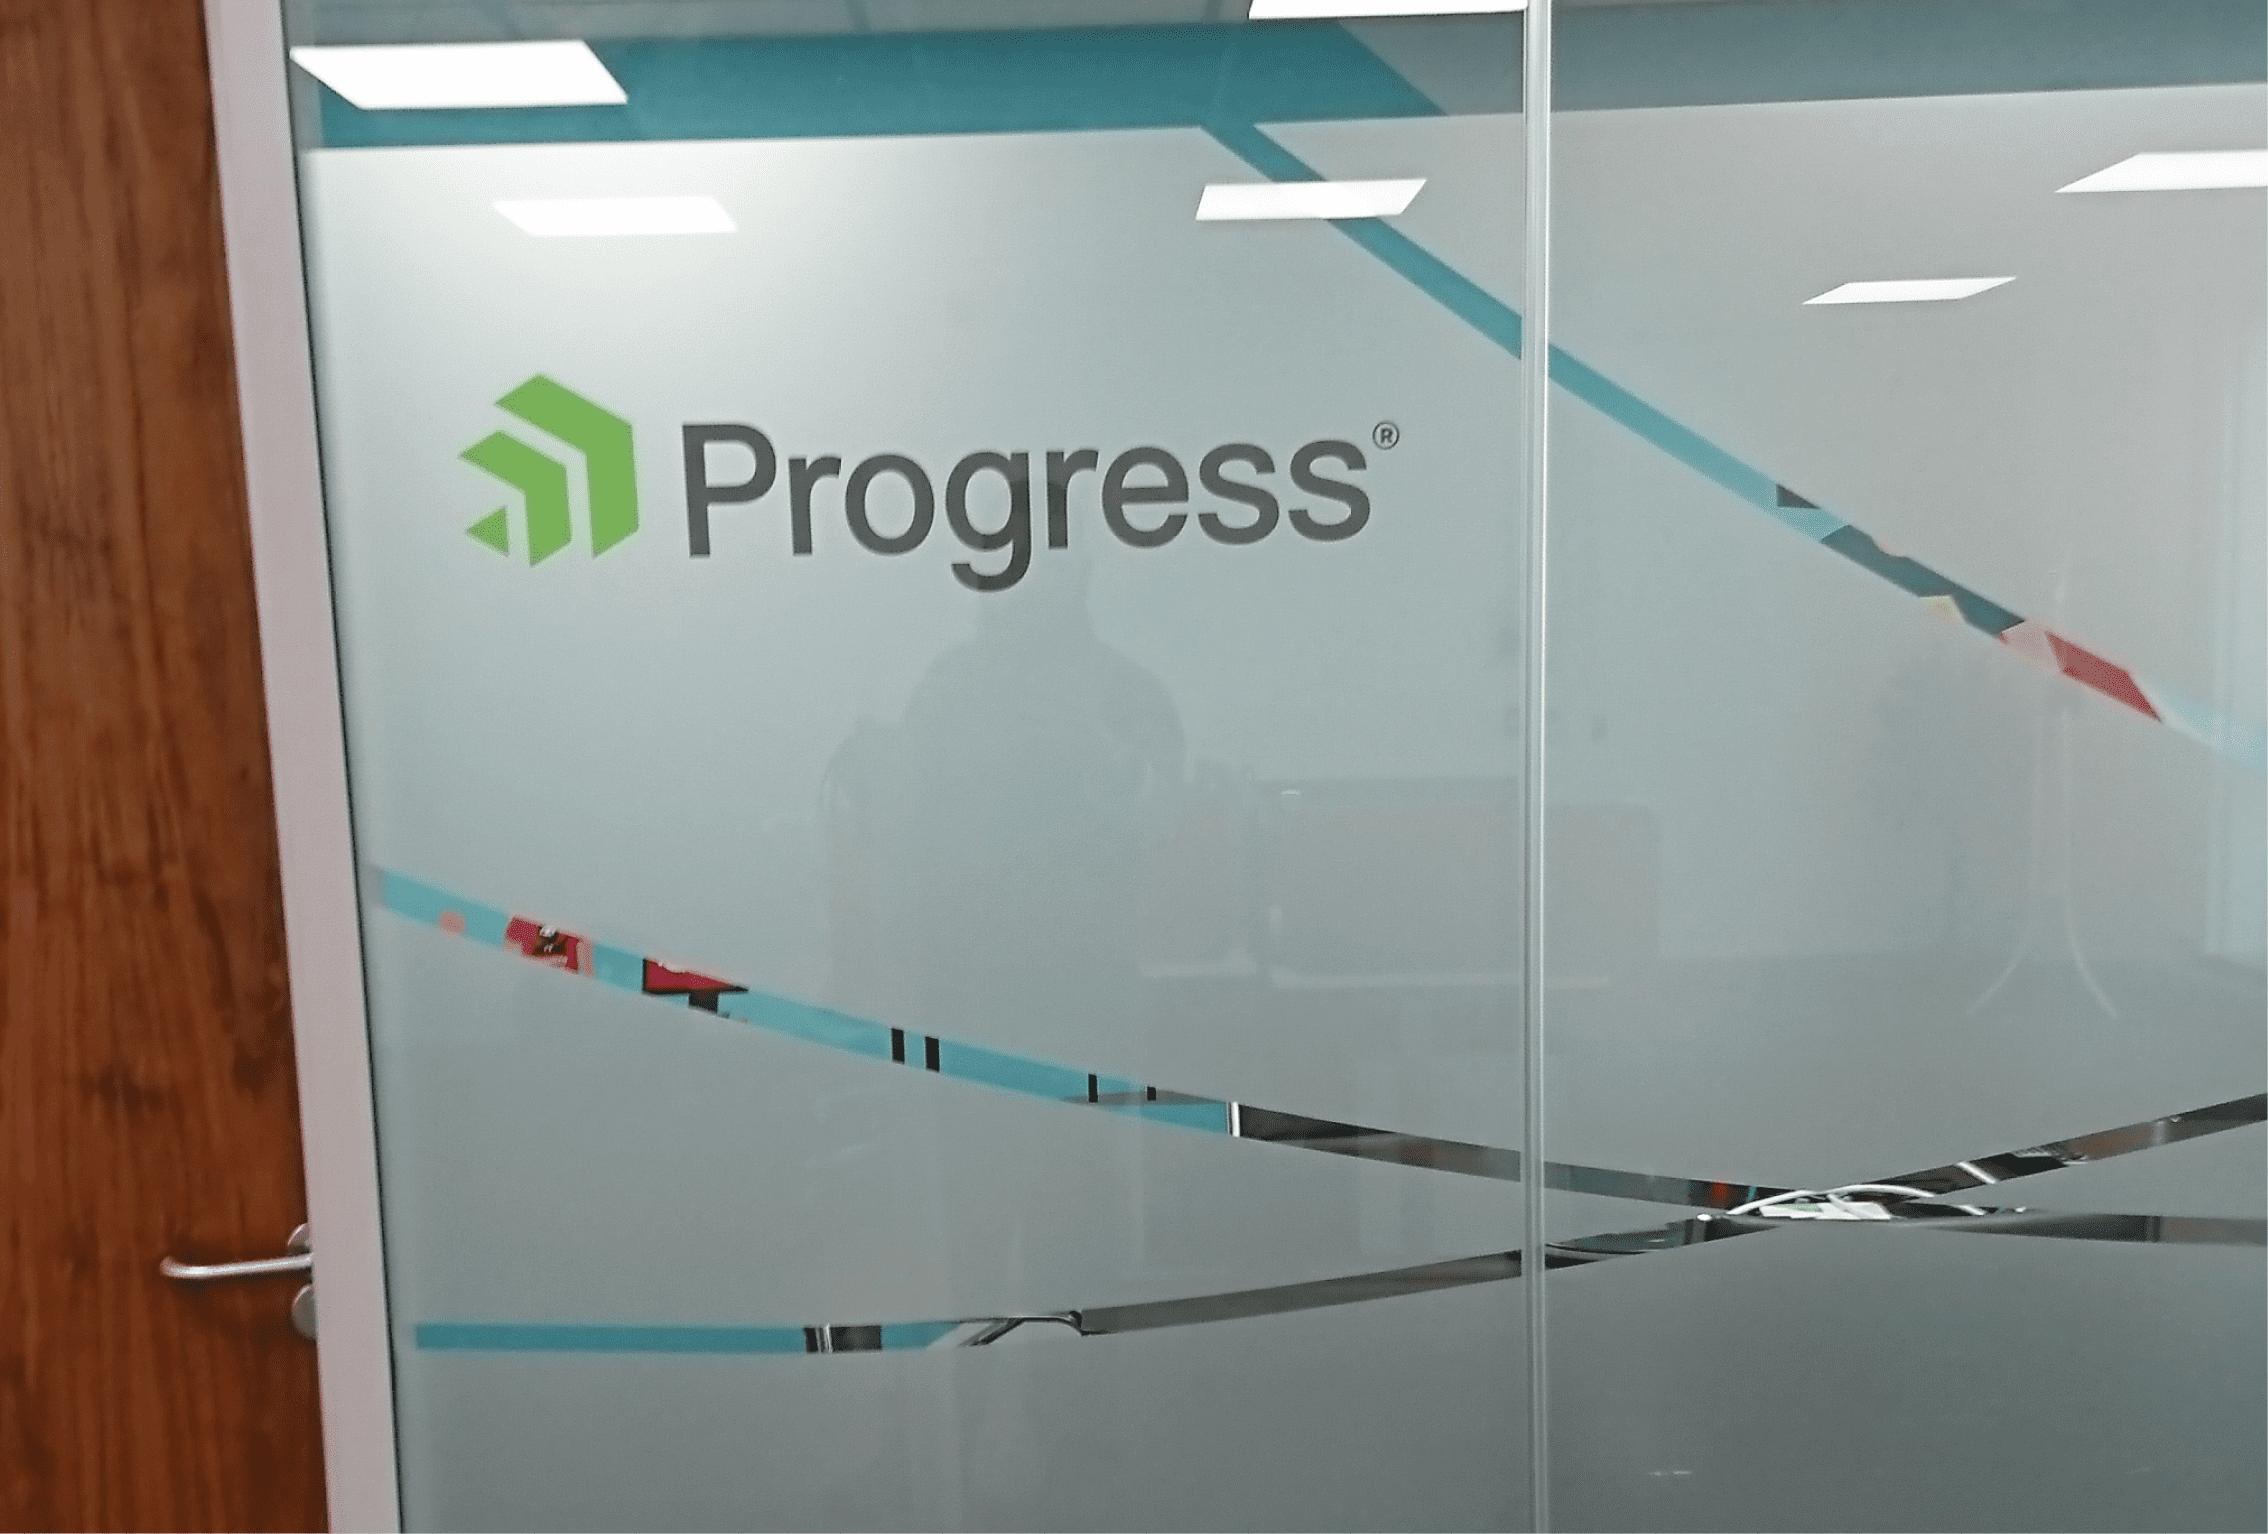 Progress Window Graphics